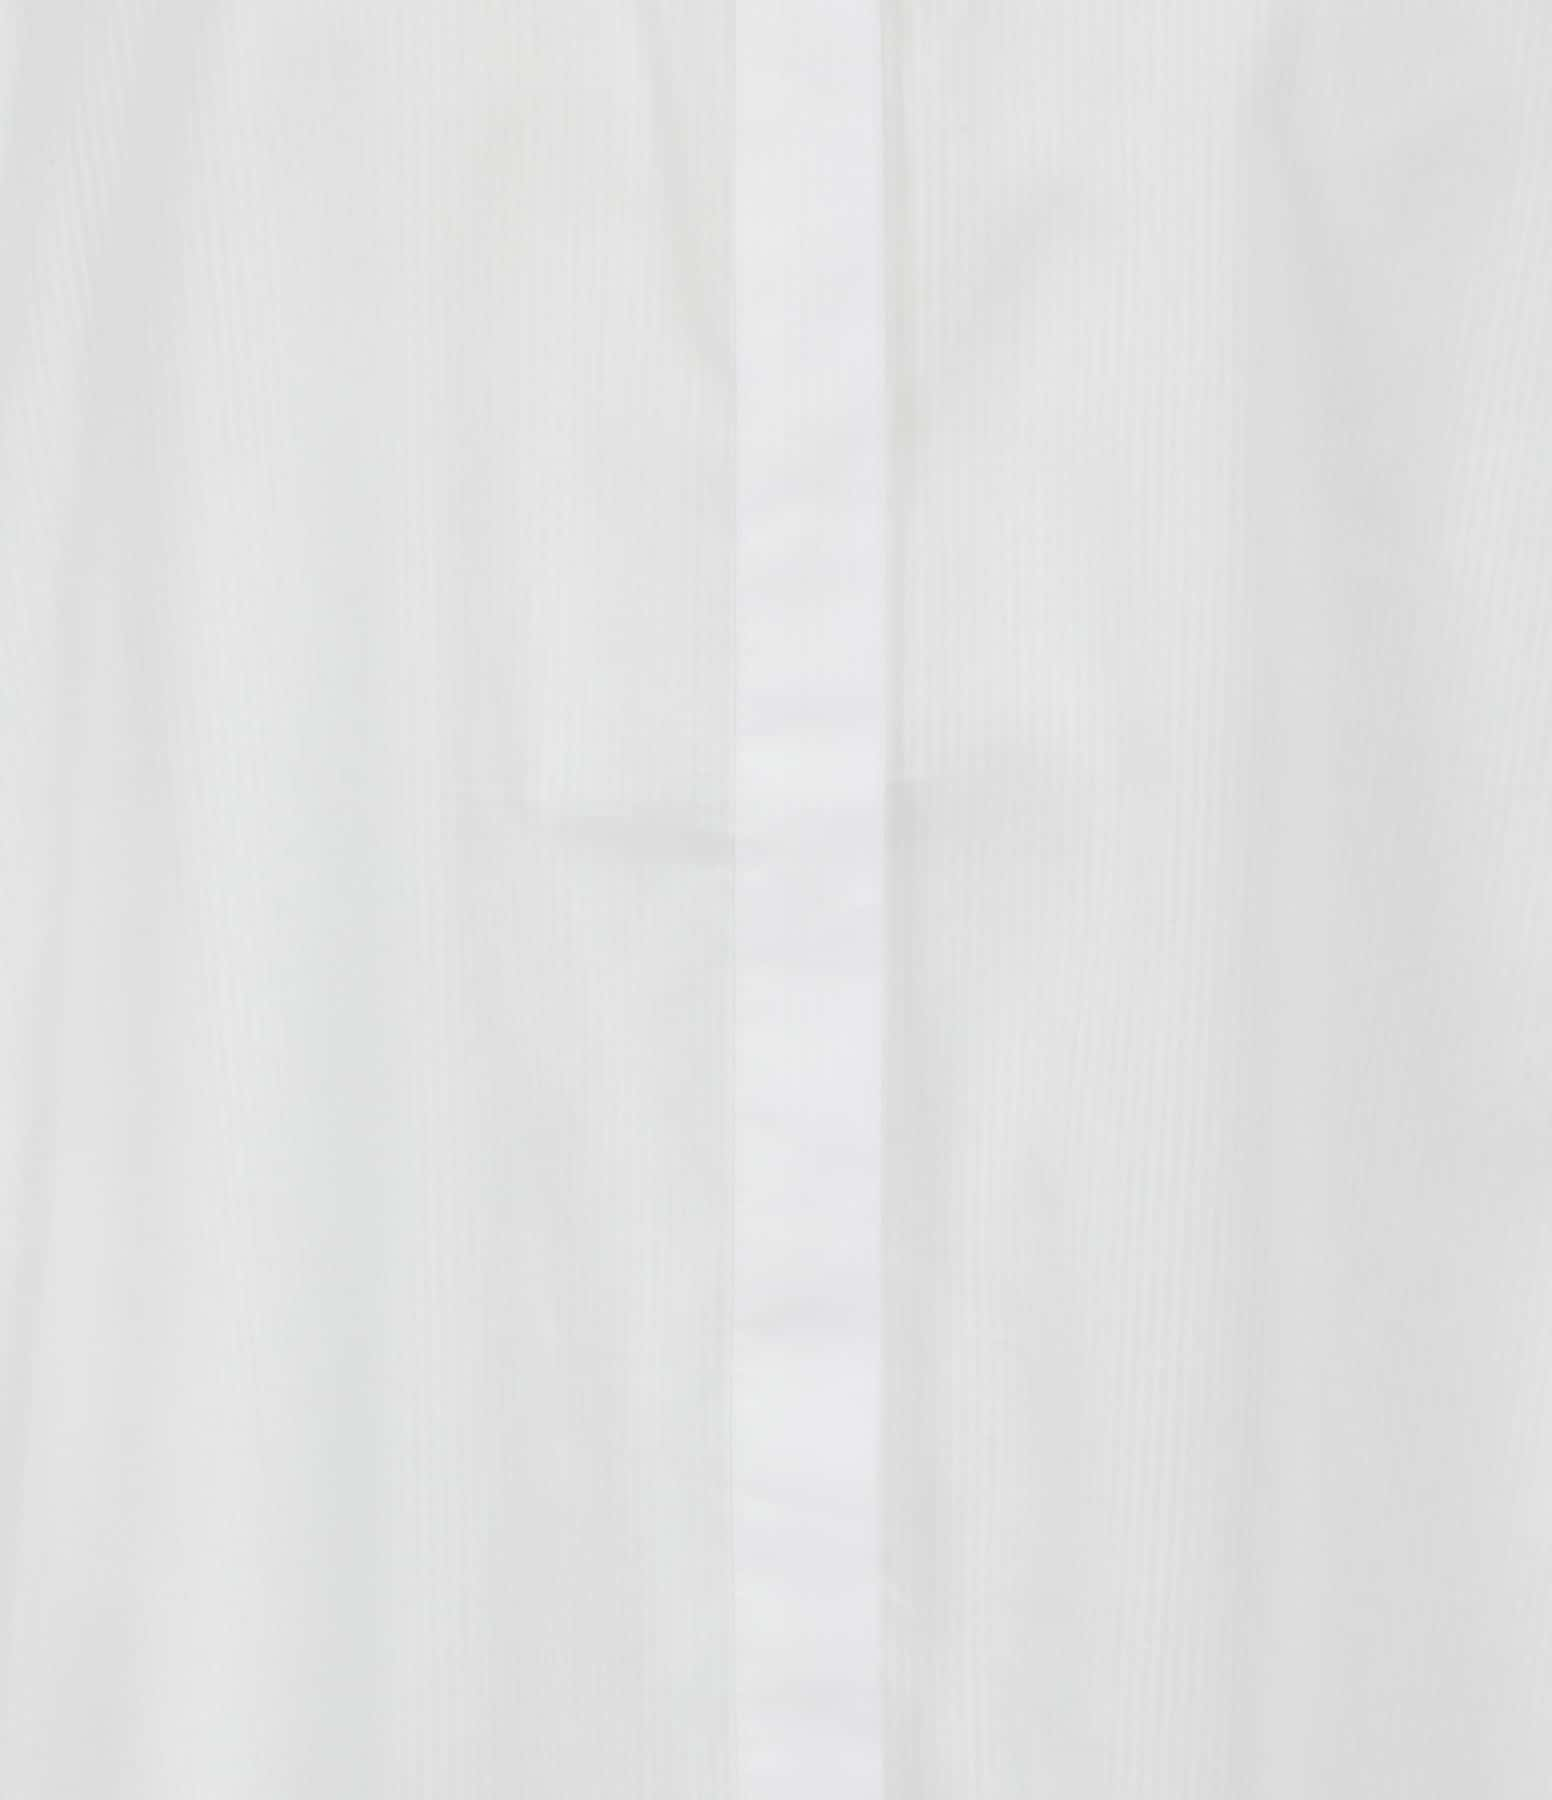 HANA SAN - Chemise Tina Blanc Optique